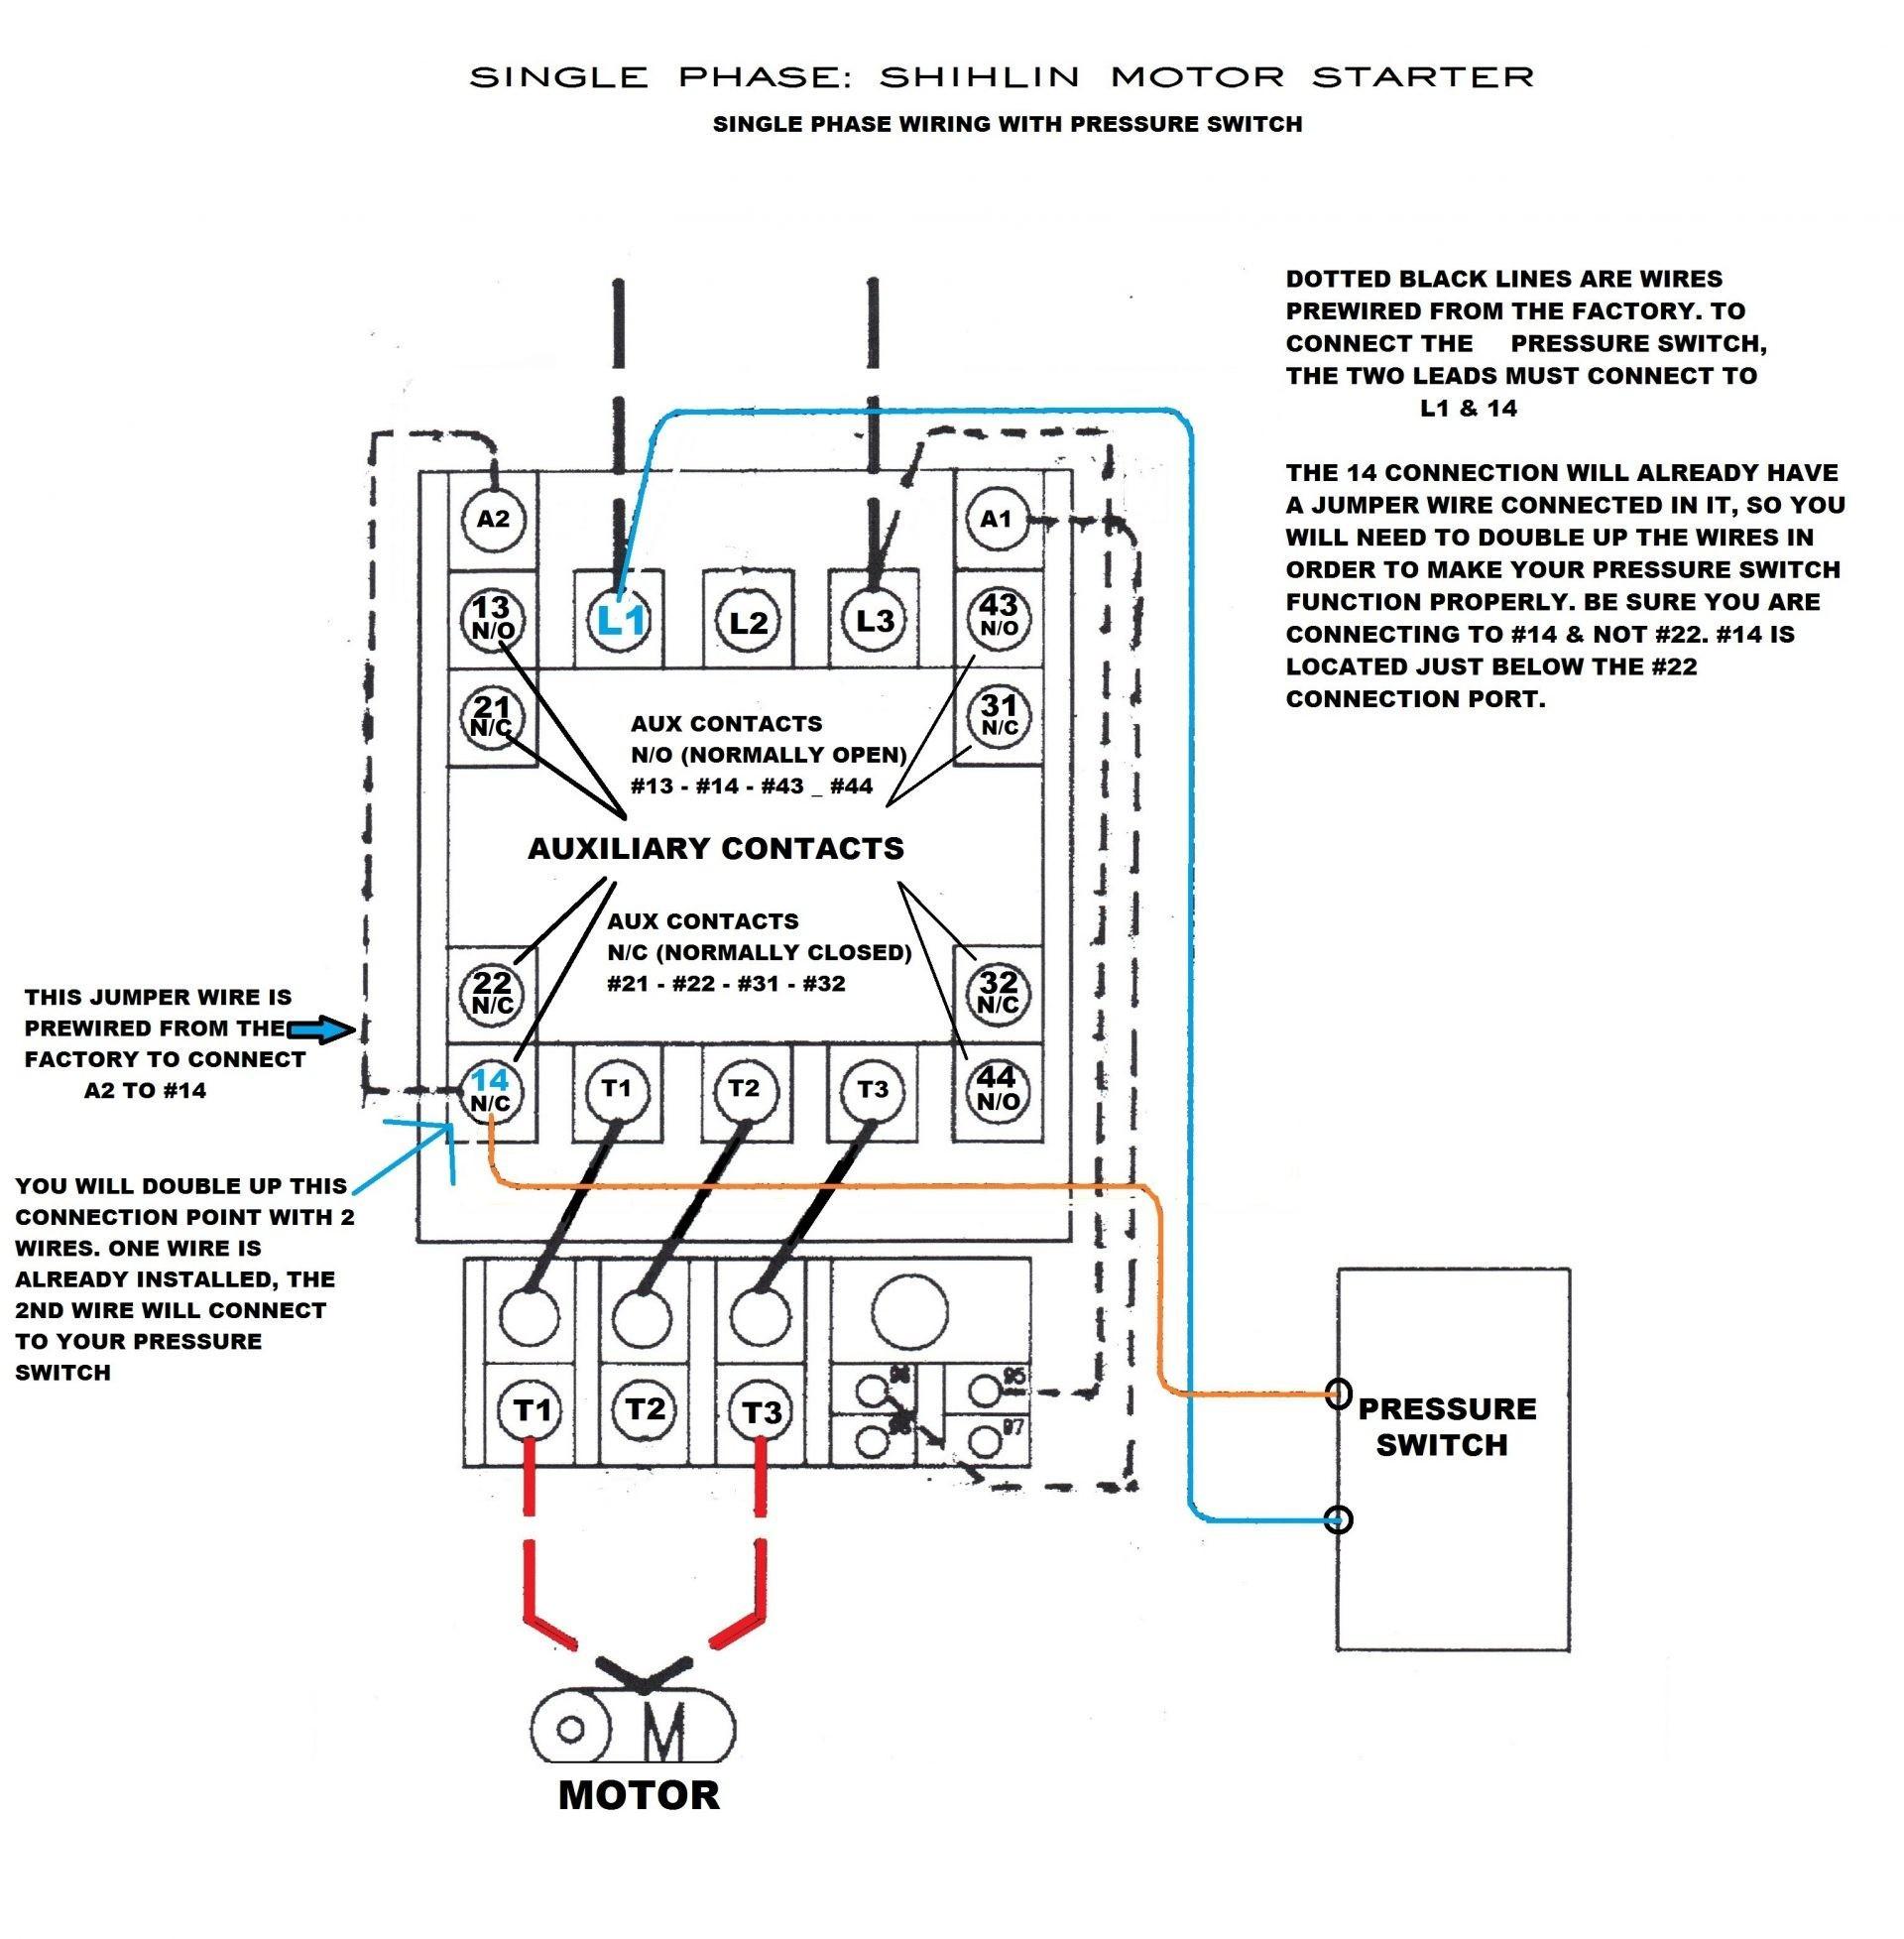 hand off auto wiring diagram sig sauer 1911 parts best of image